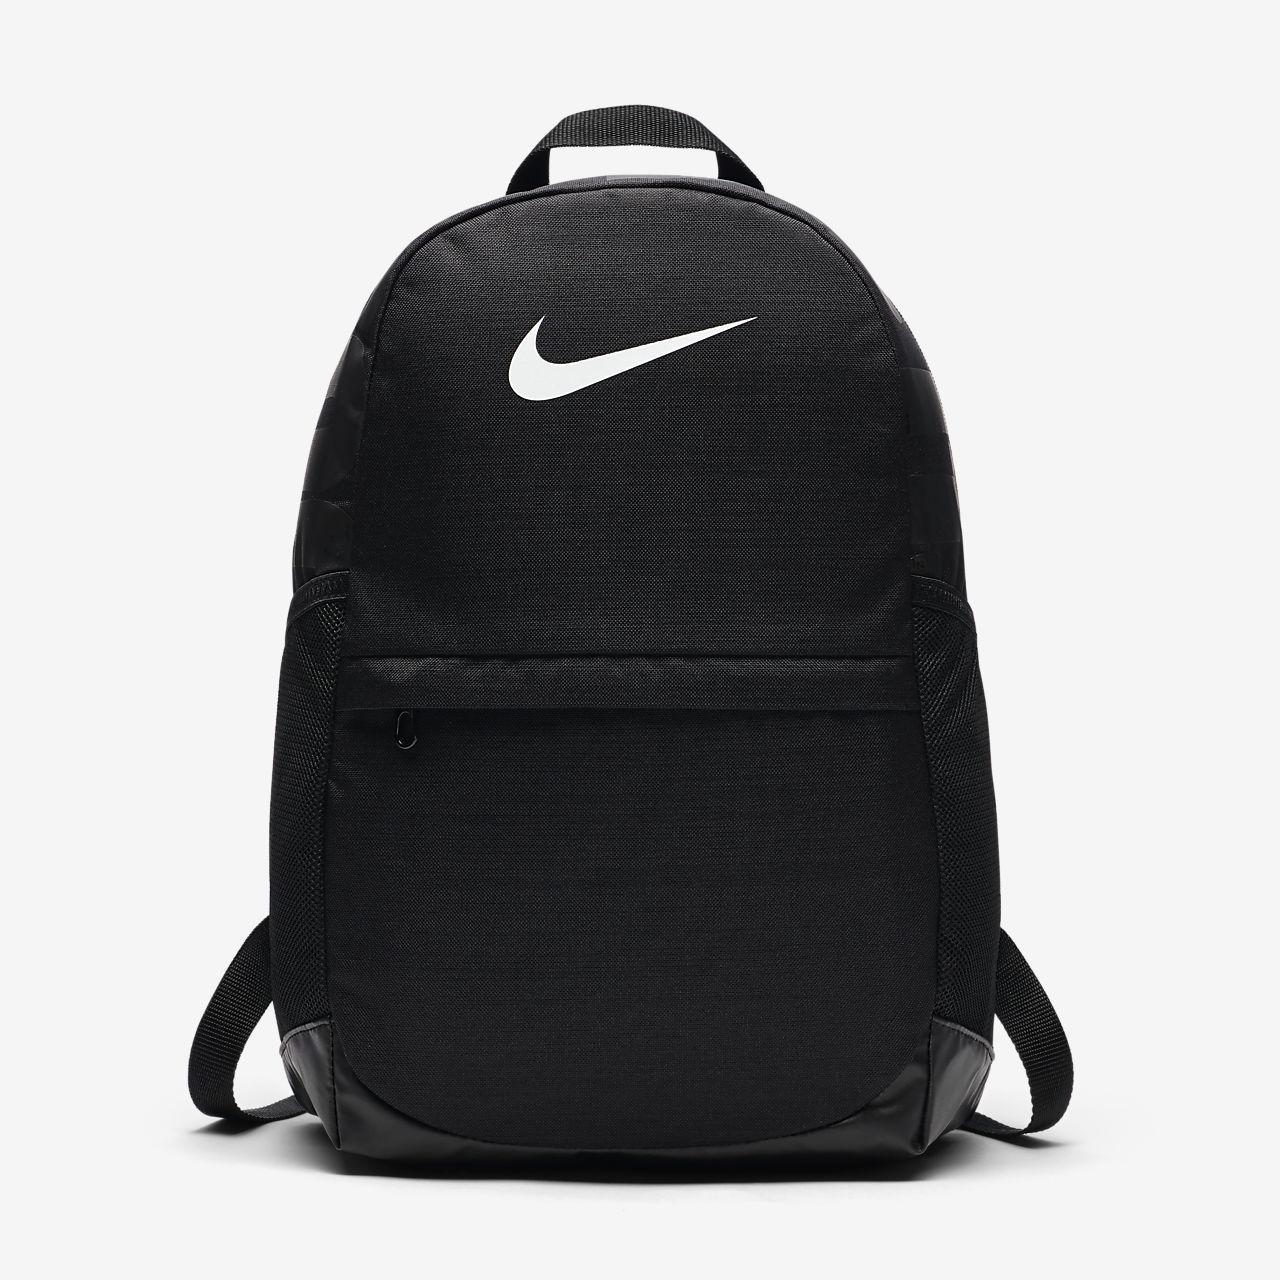 d91b46dcd Low Resolution Mochila Nike Brasilia para criança Mochila Nike Brasilia  para criança